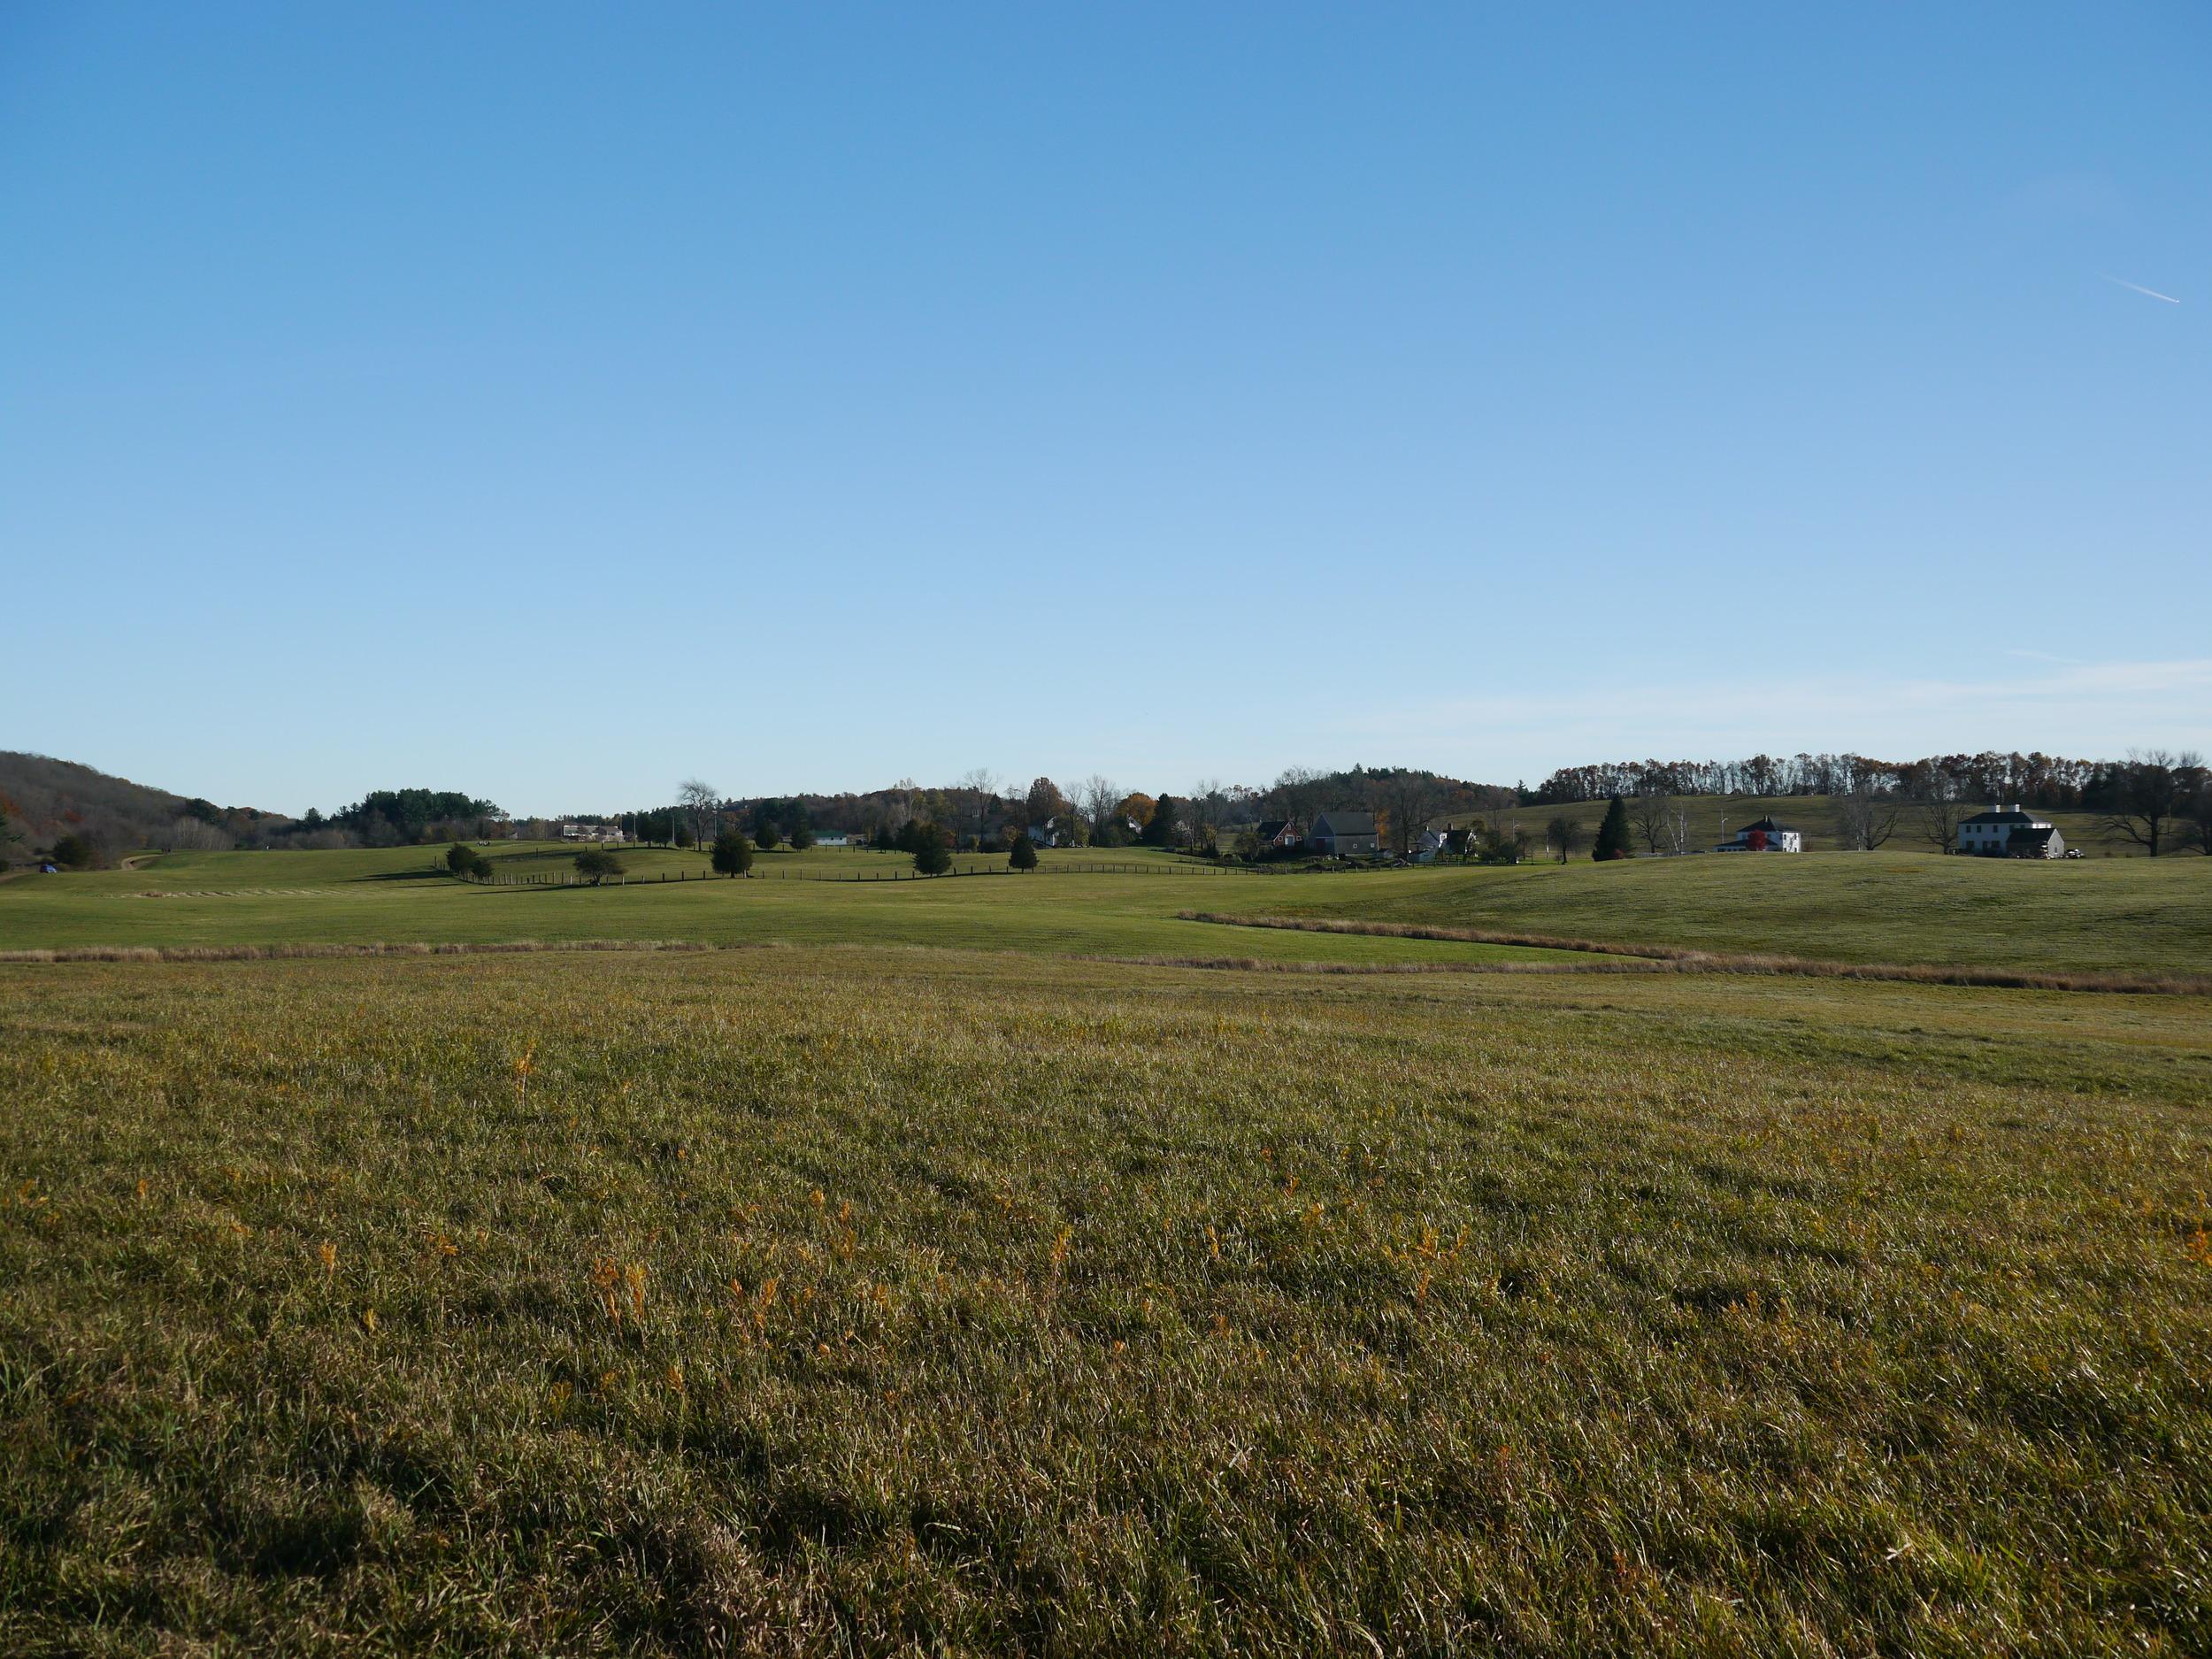 The beautiful Amesbury, MA launch site.